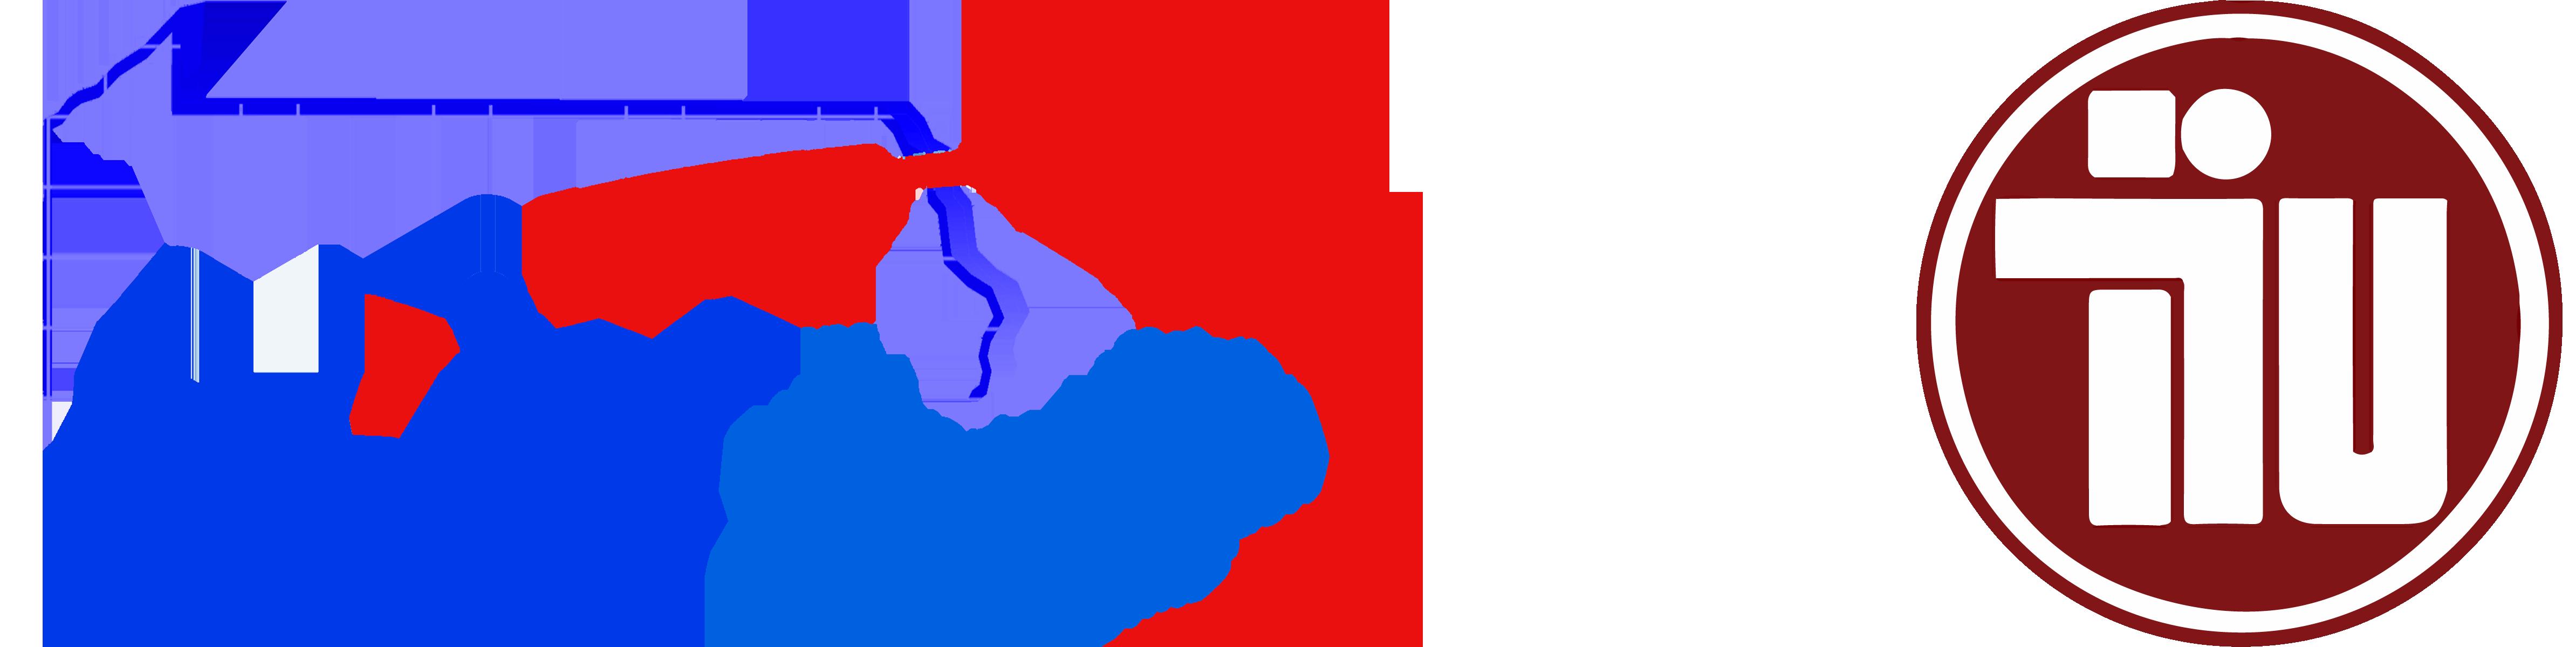 PAIU - TIU Logo